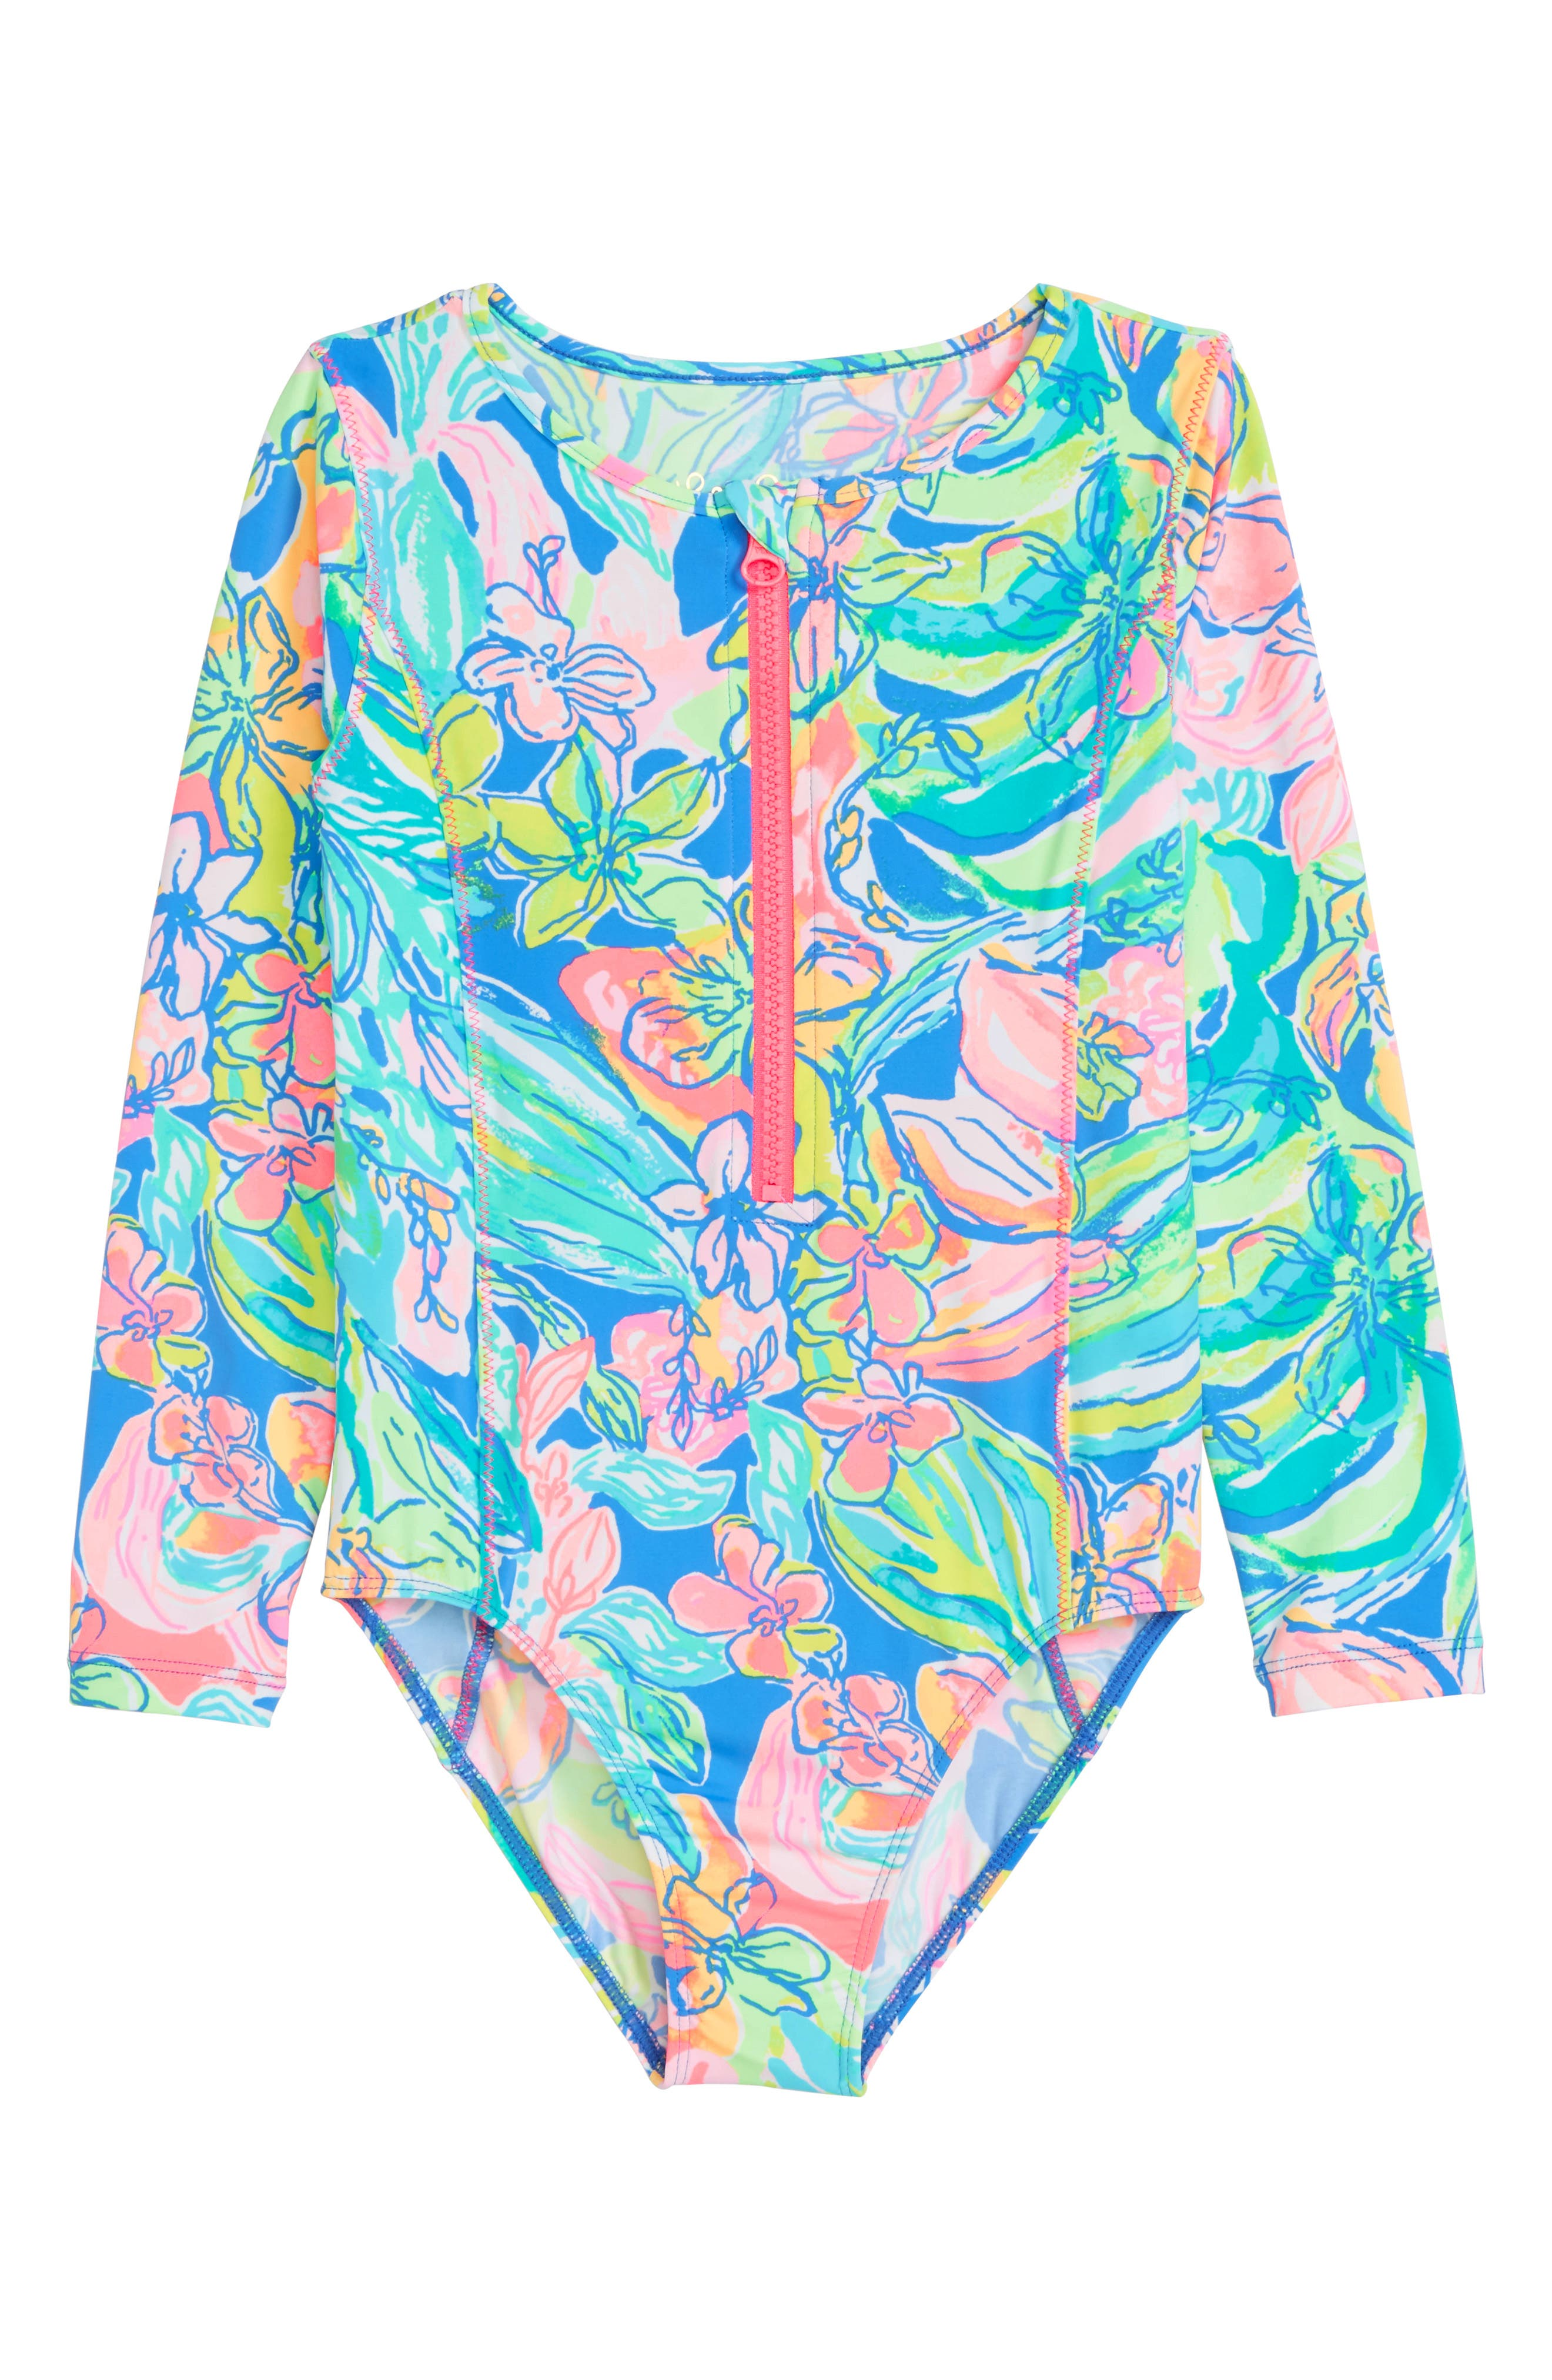 Aliana UPF 50+ One-Piece Rashguard Swimsuit,                         Main,                         color, Bennet Blue Surf Gypsea